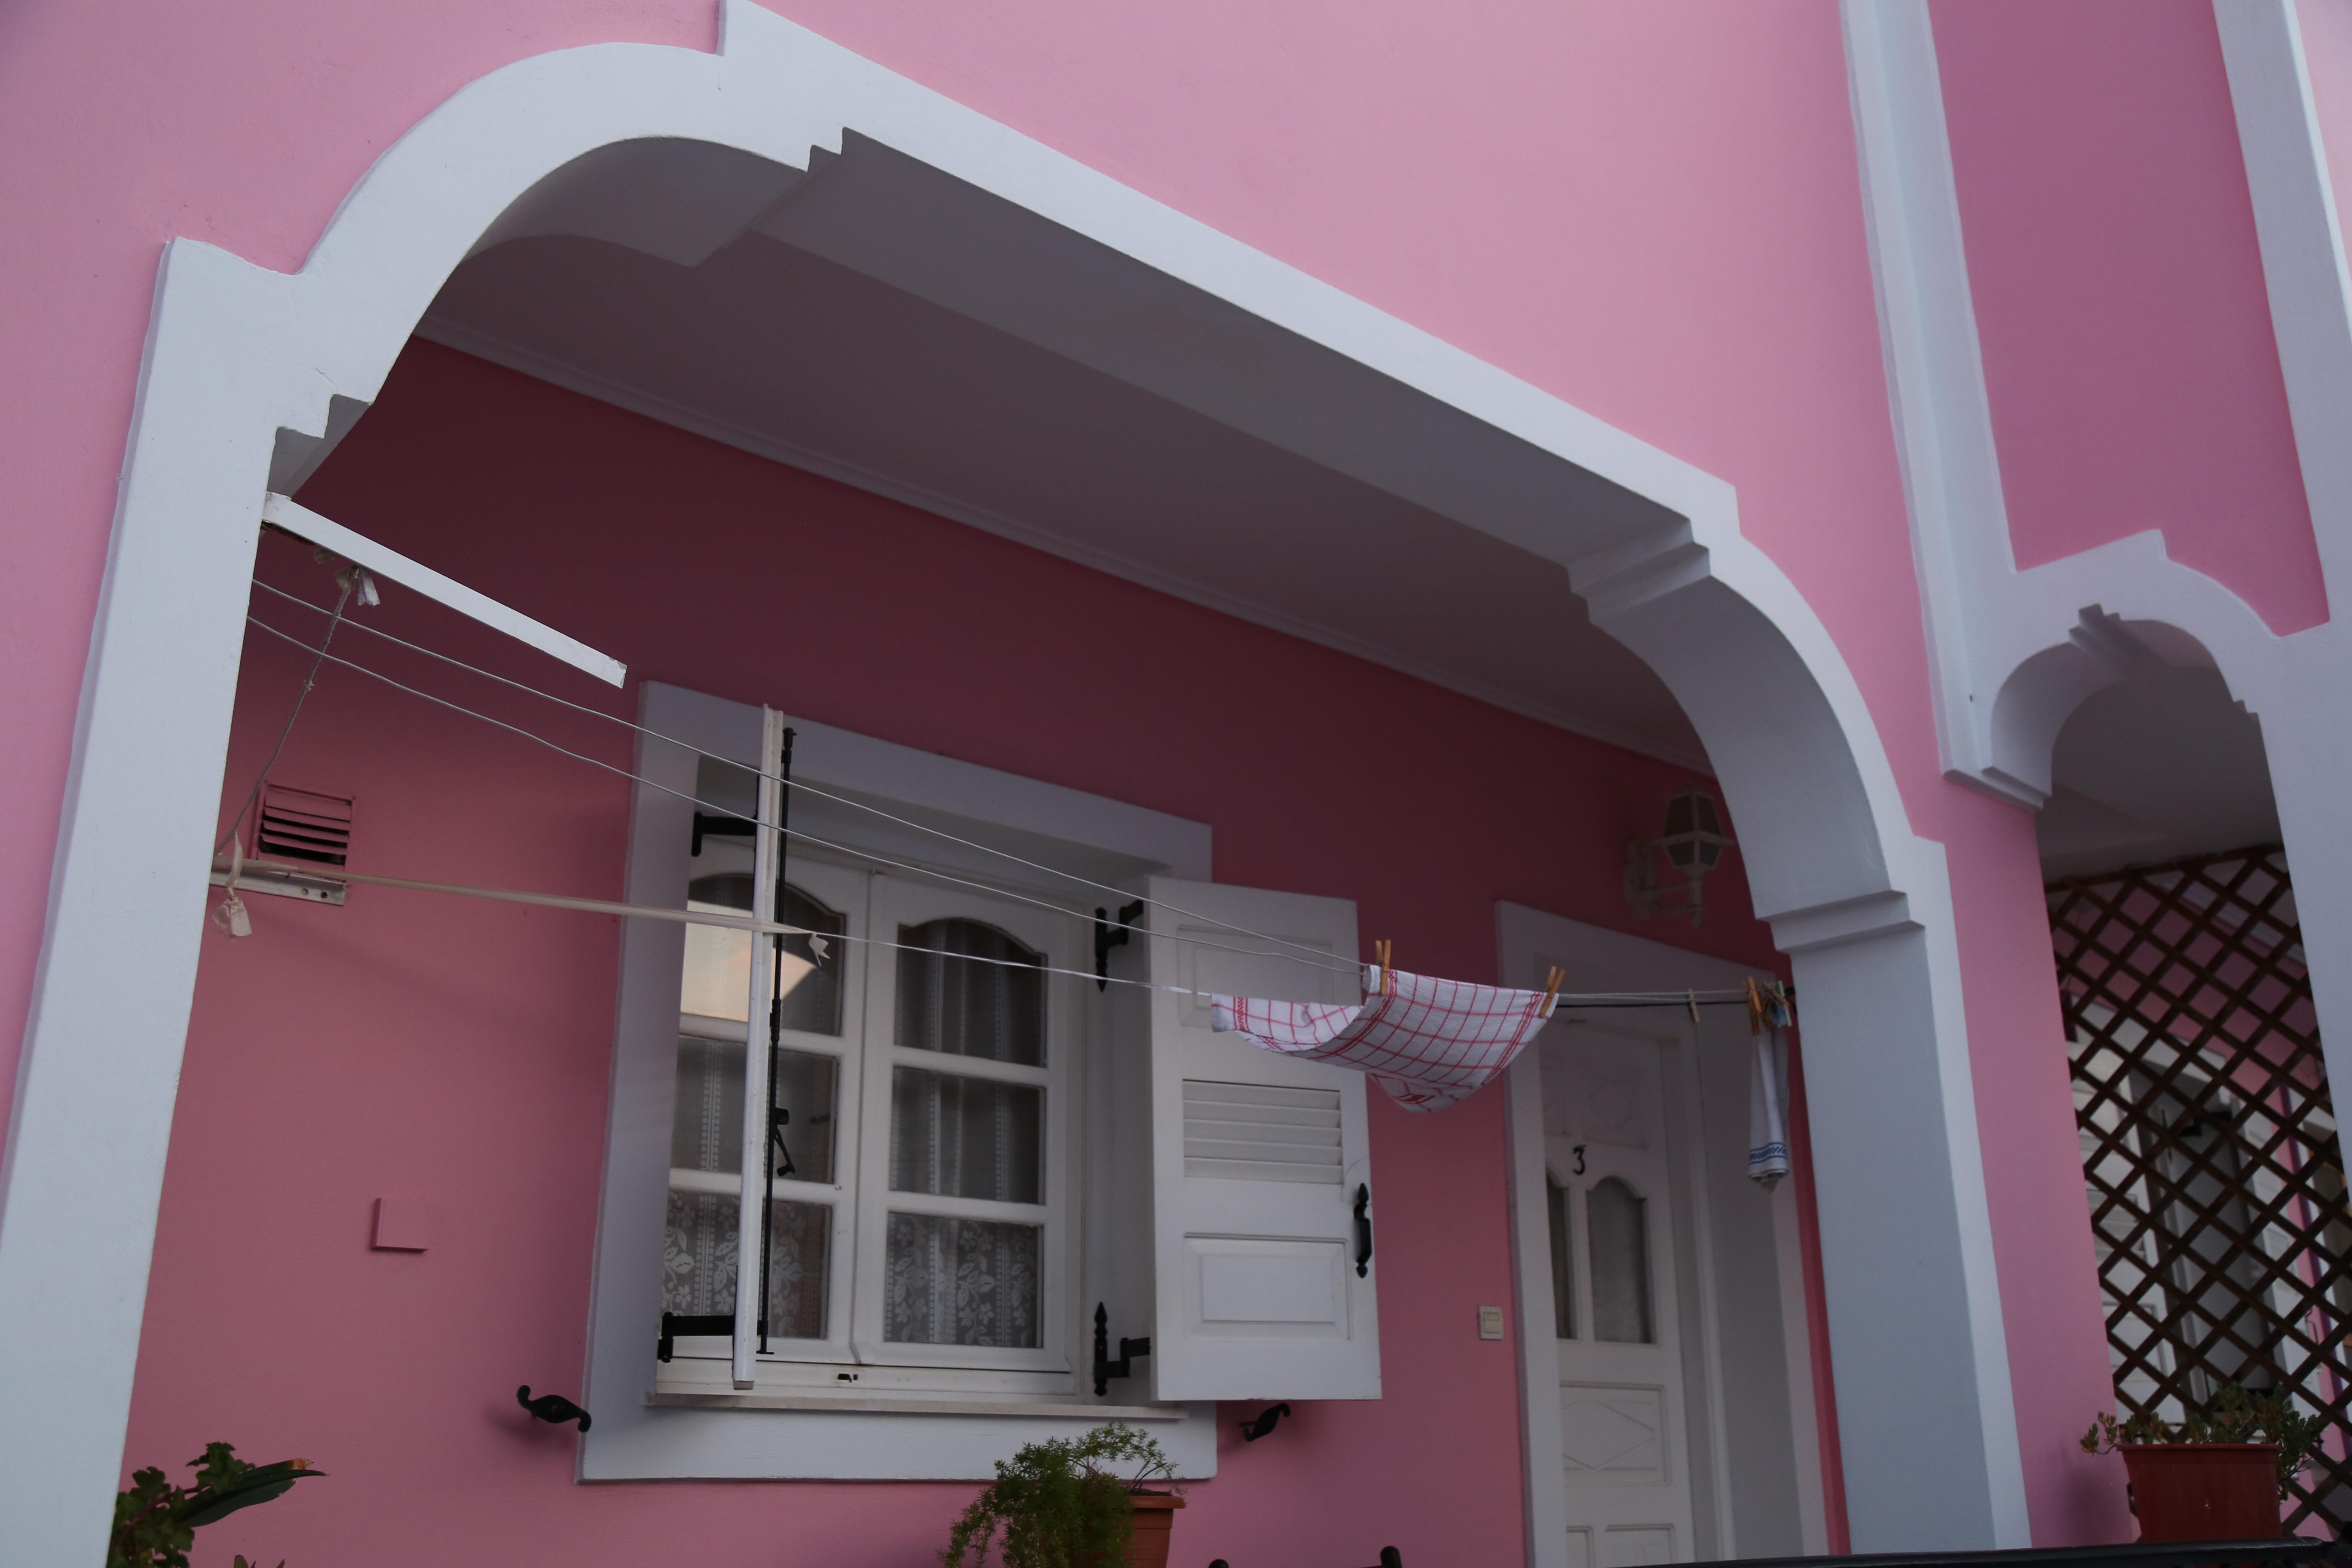 Santorini pink house